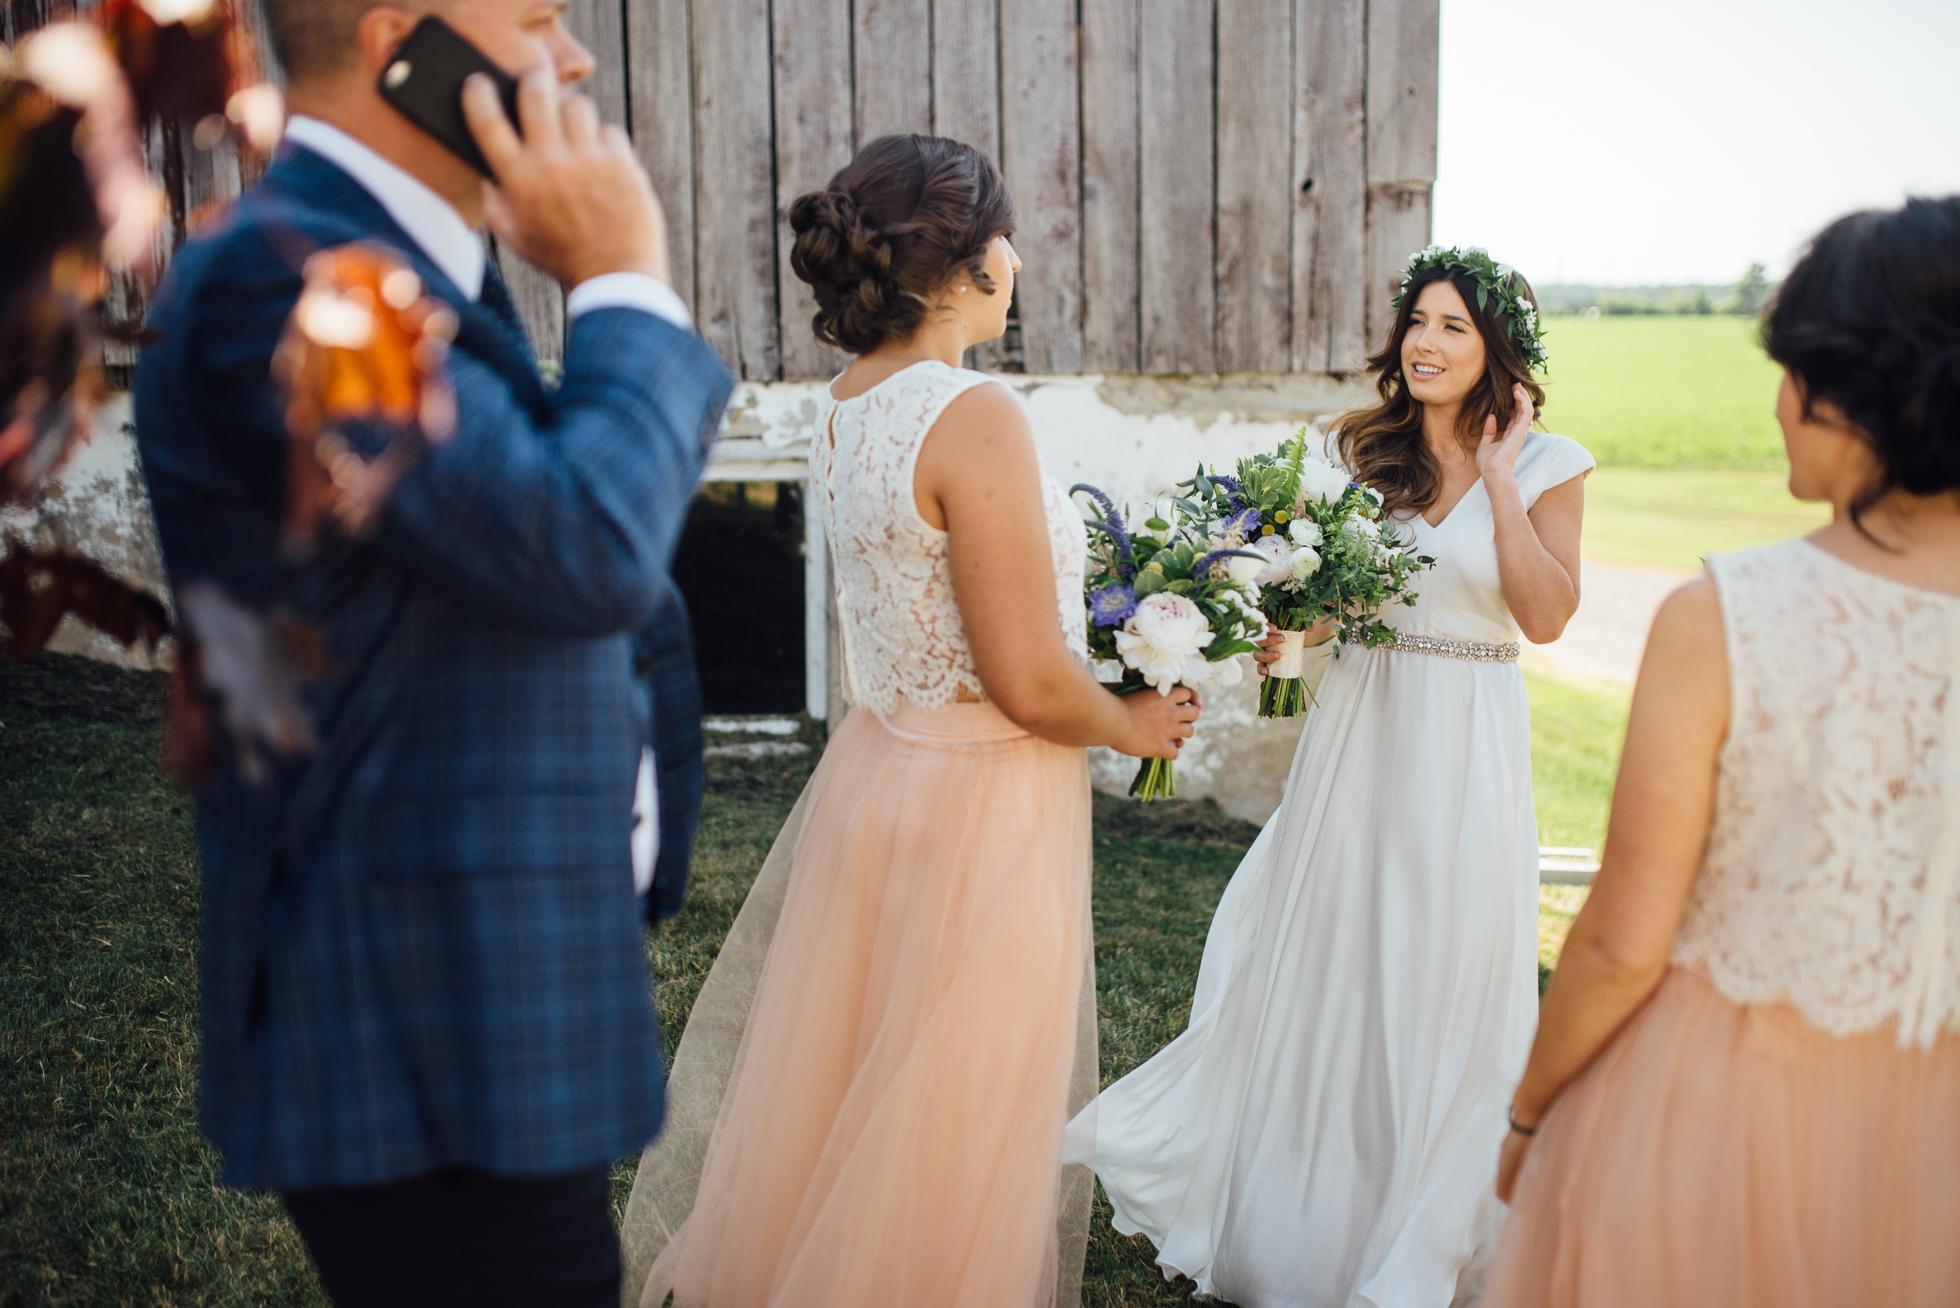 Downswell-Barn-Wedding-Photography-30.jpg